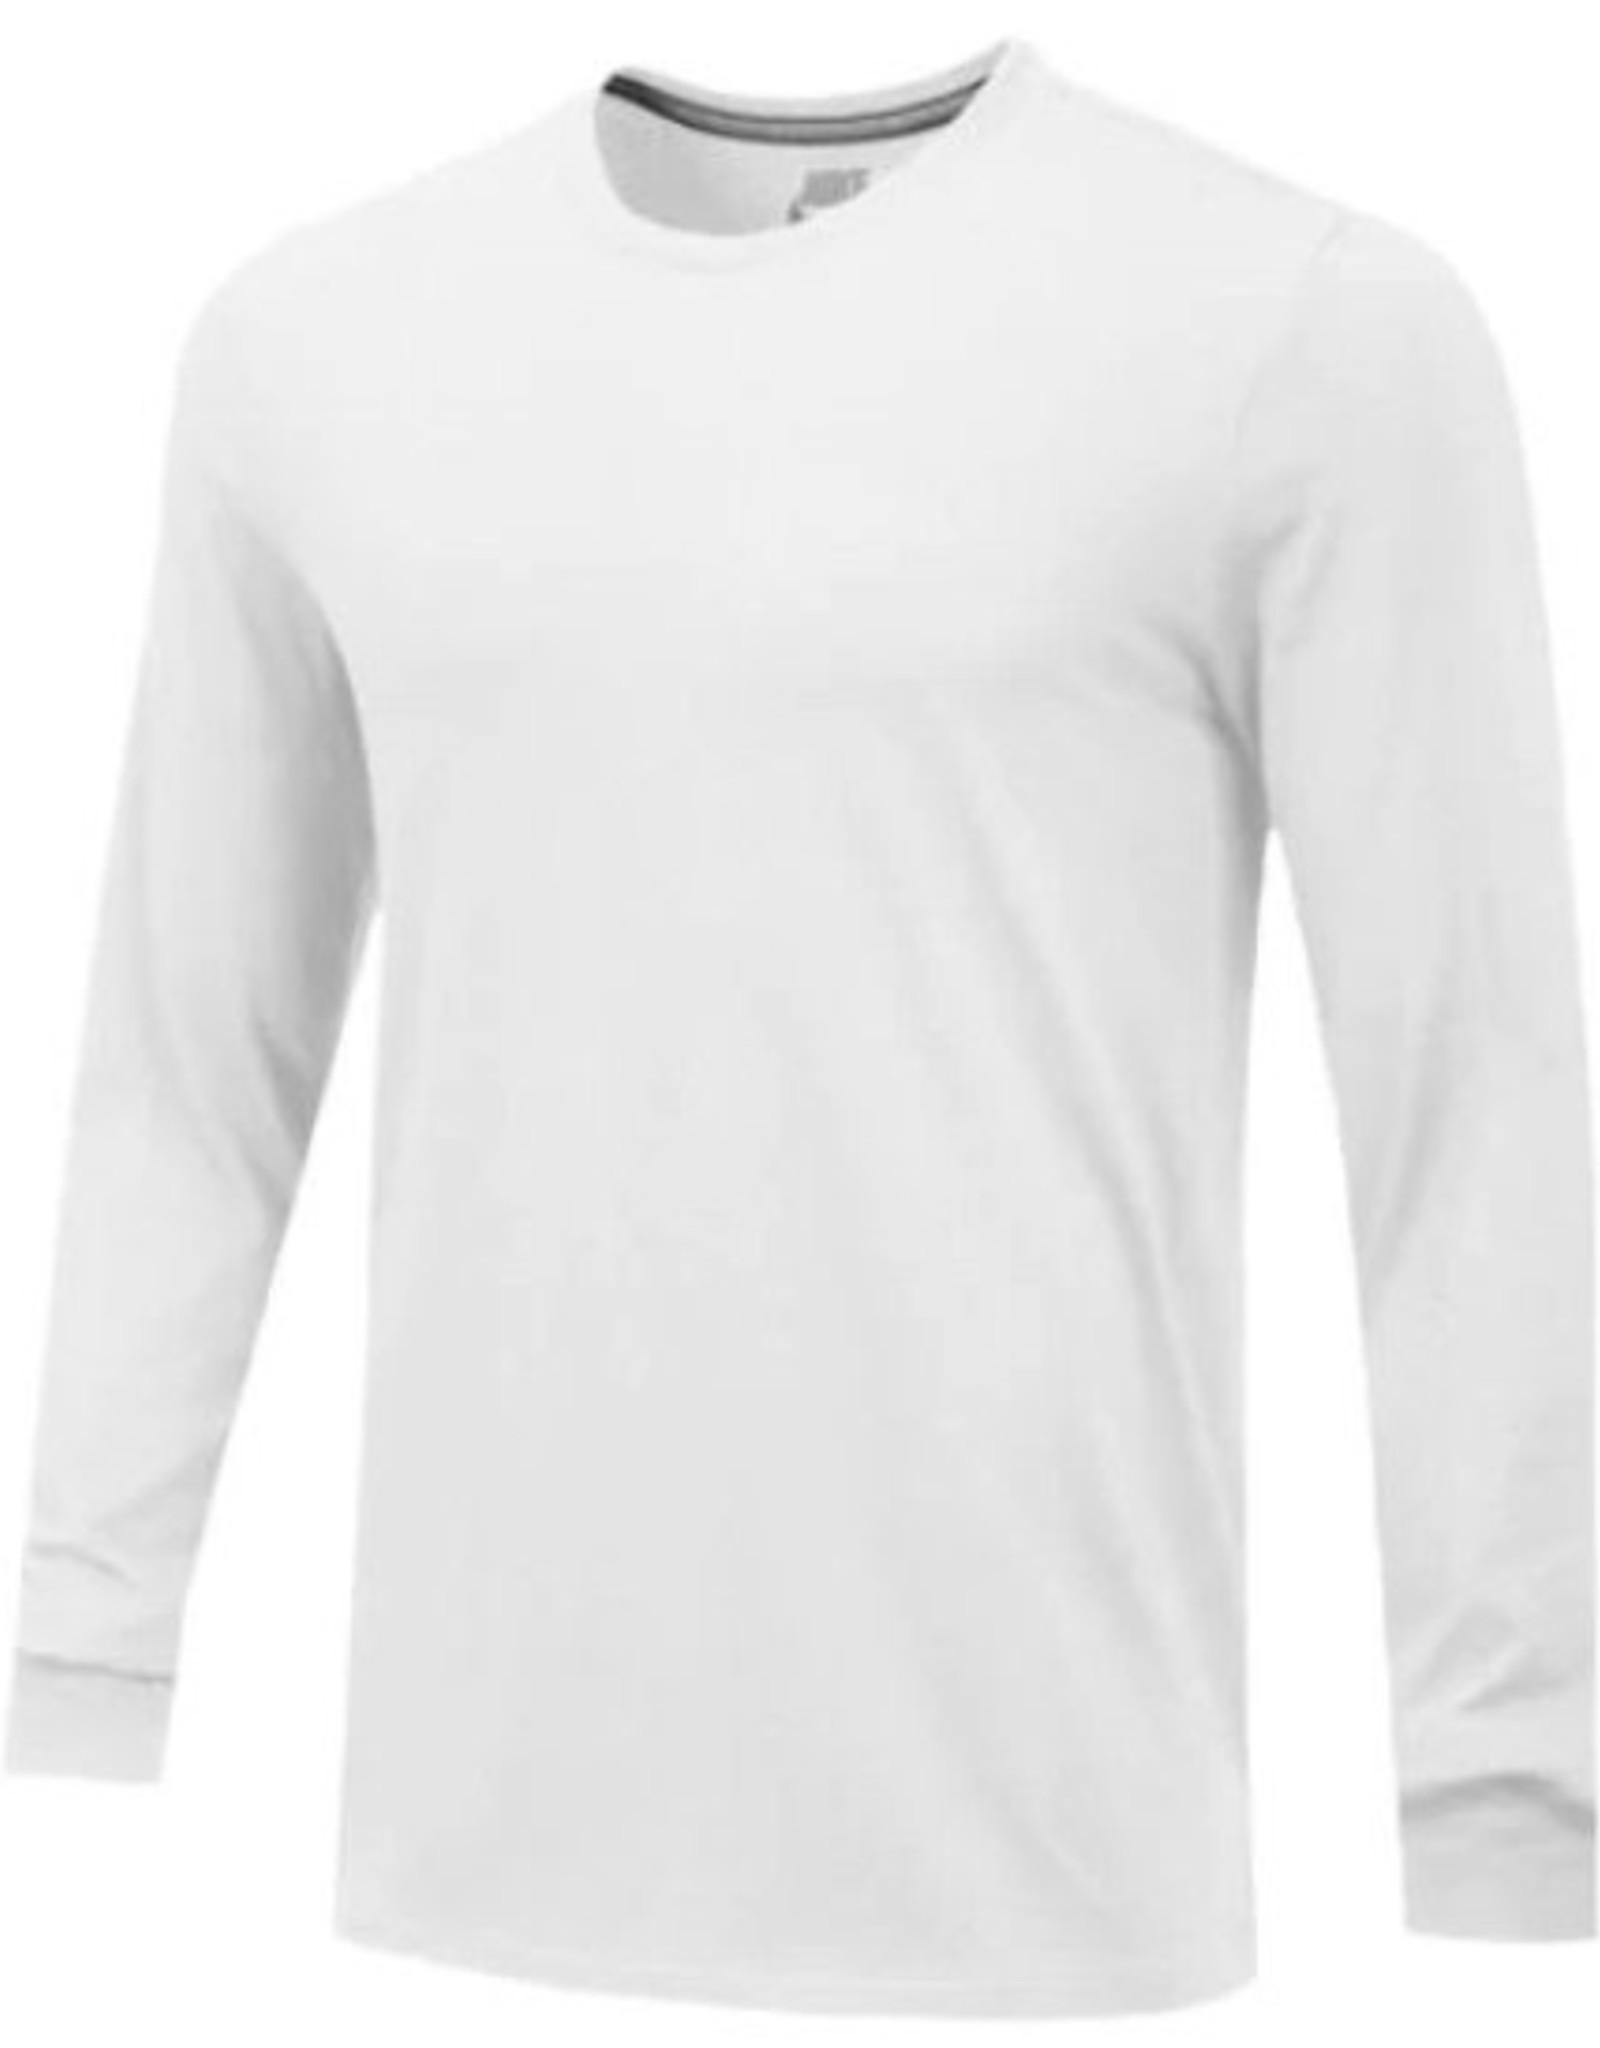 NON-UNIFORM JD Boys Tennis Nike Long Sleeve Shirt